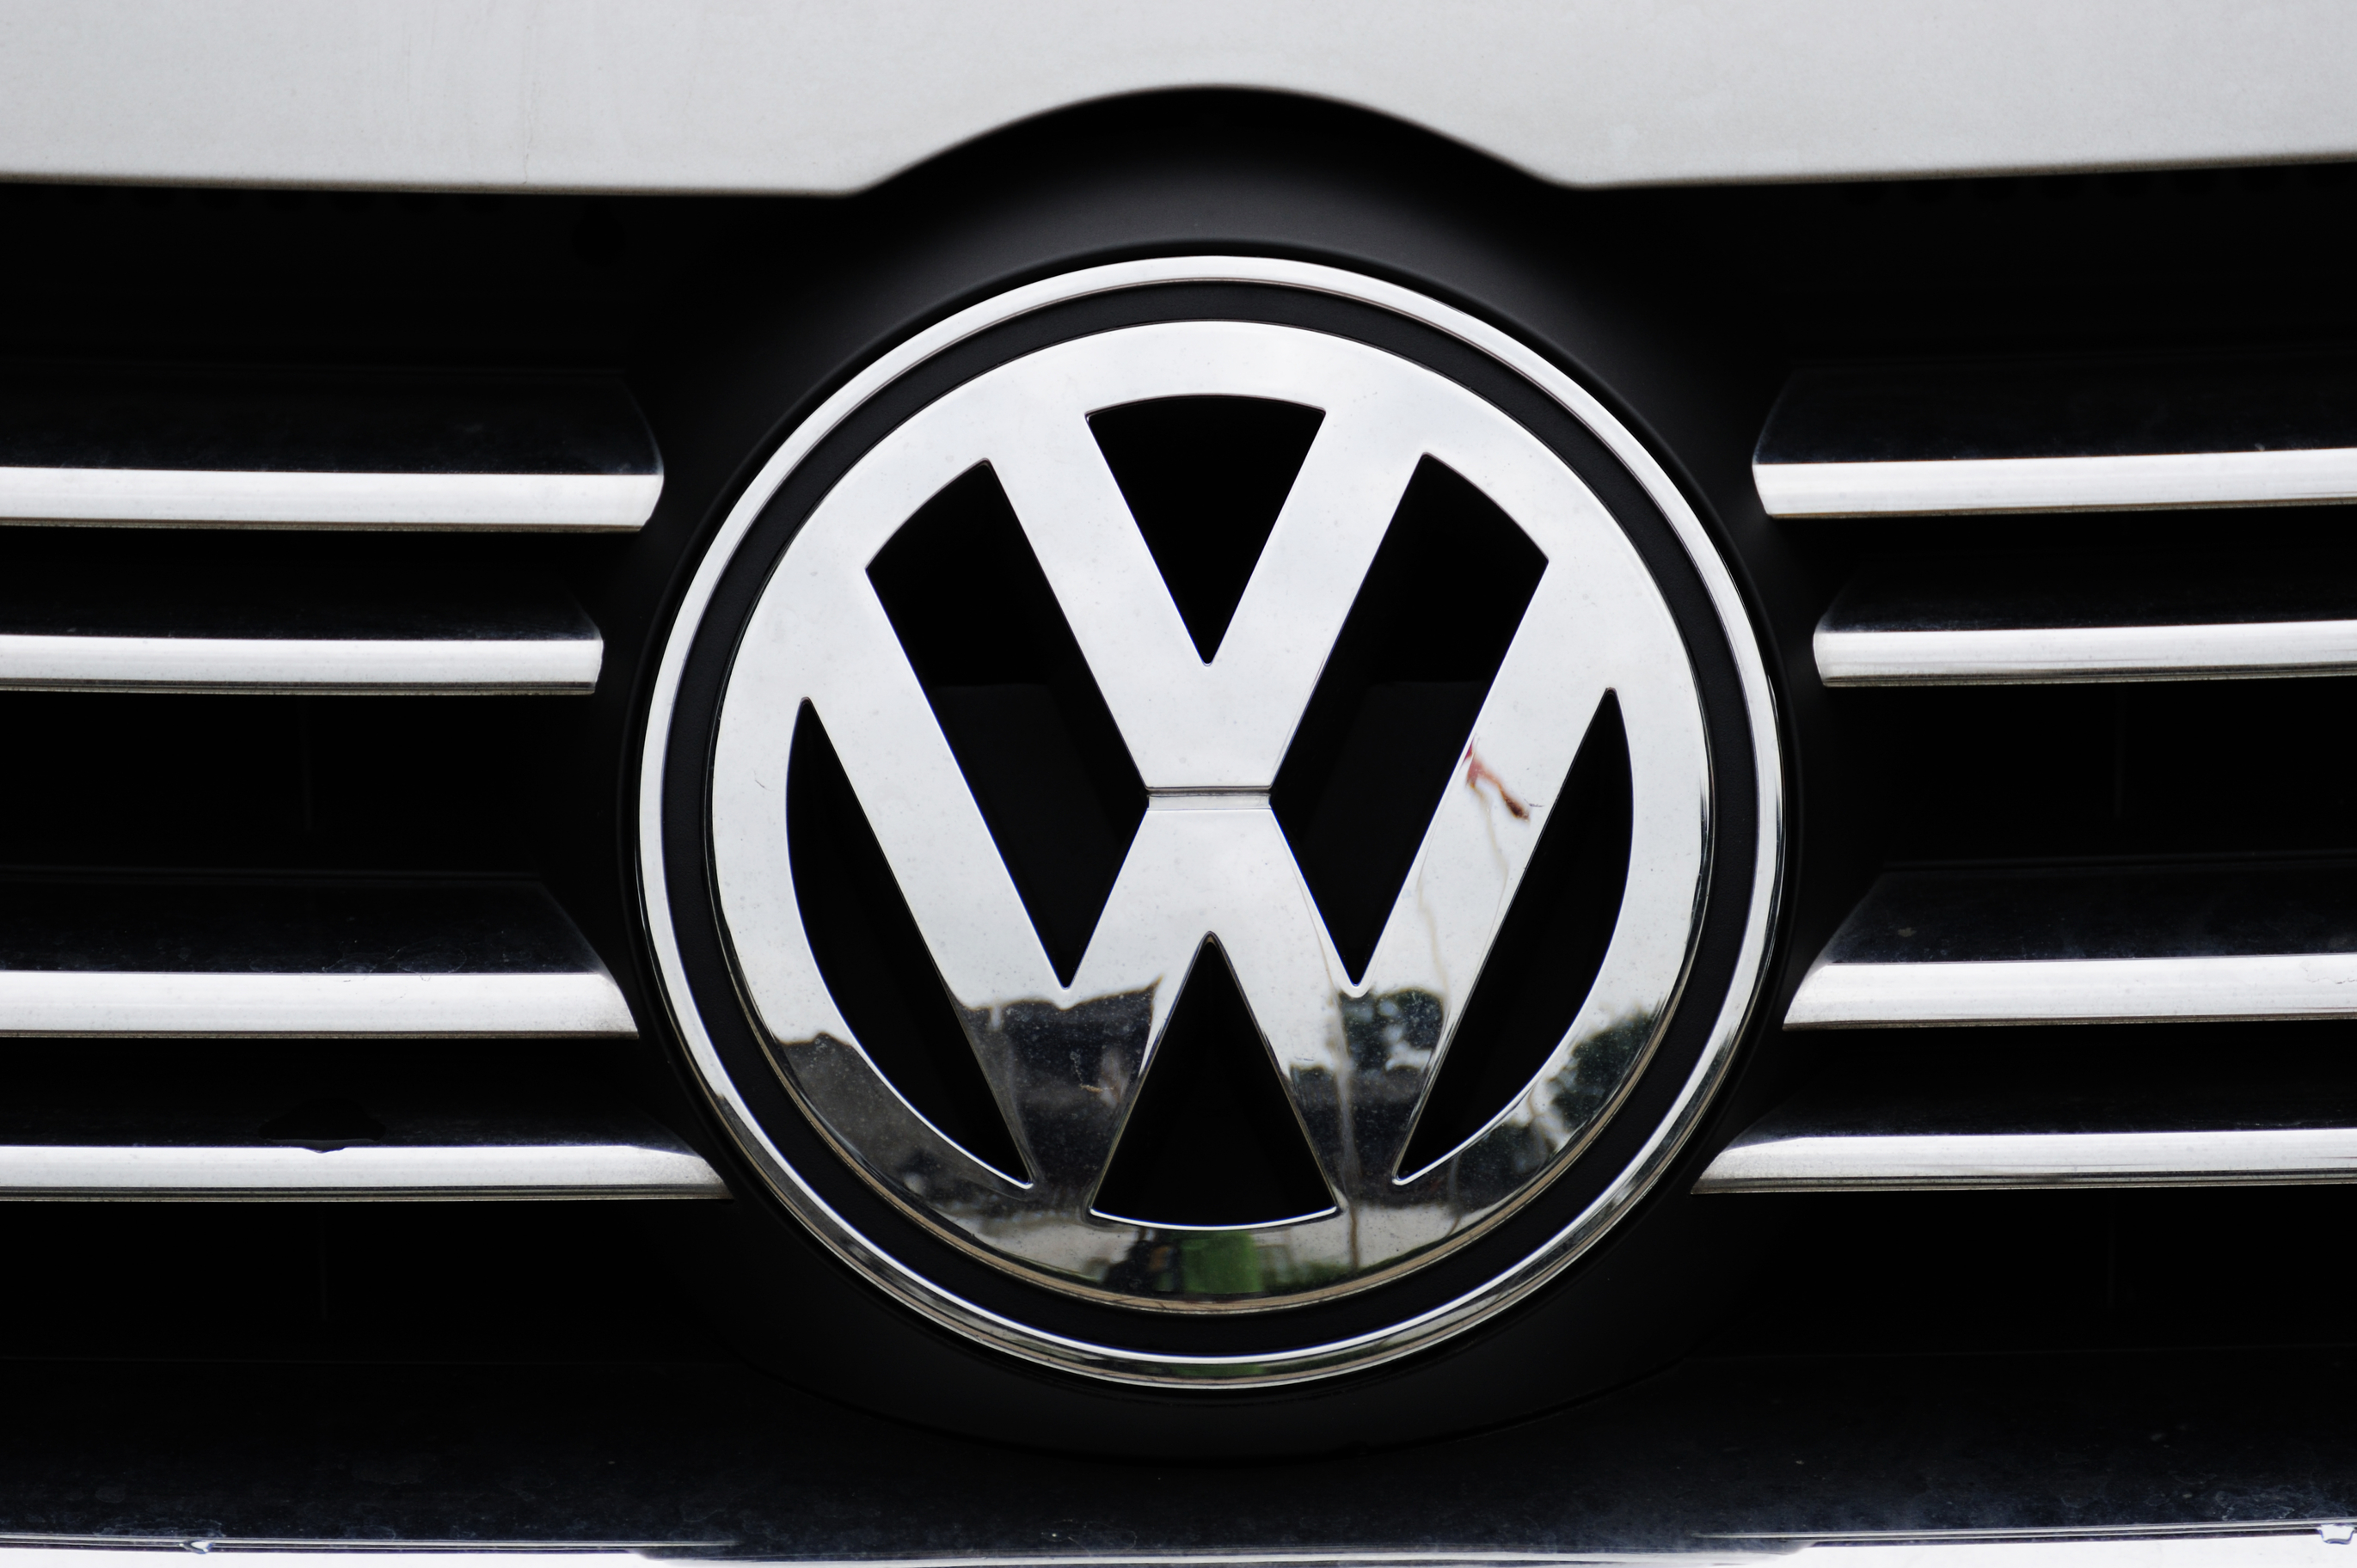 Strauss Troy Wins VW Case Jurisdiction Battle for Three Greater Cincinnati Volkswagen Diesel ...